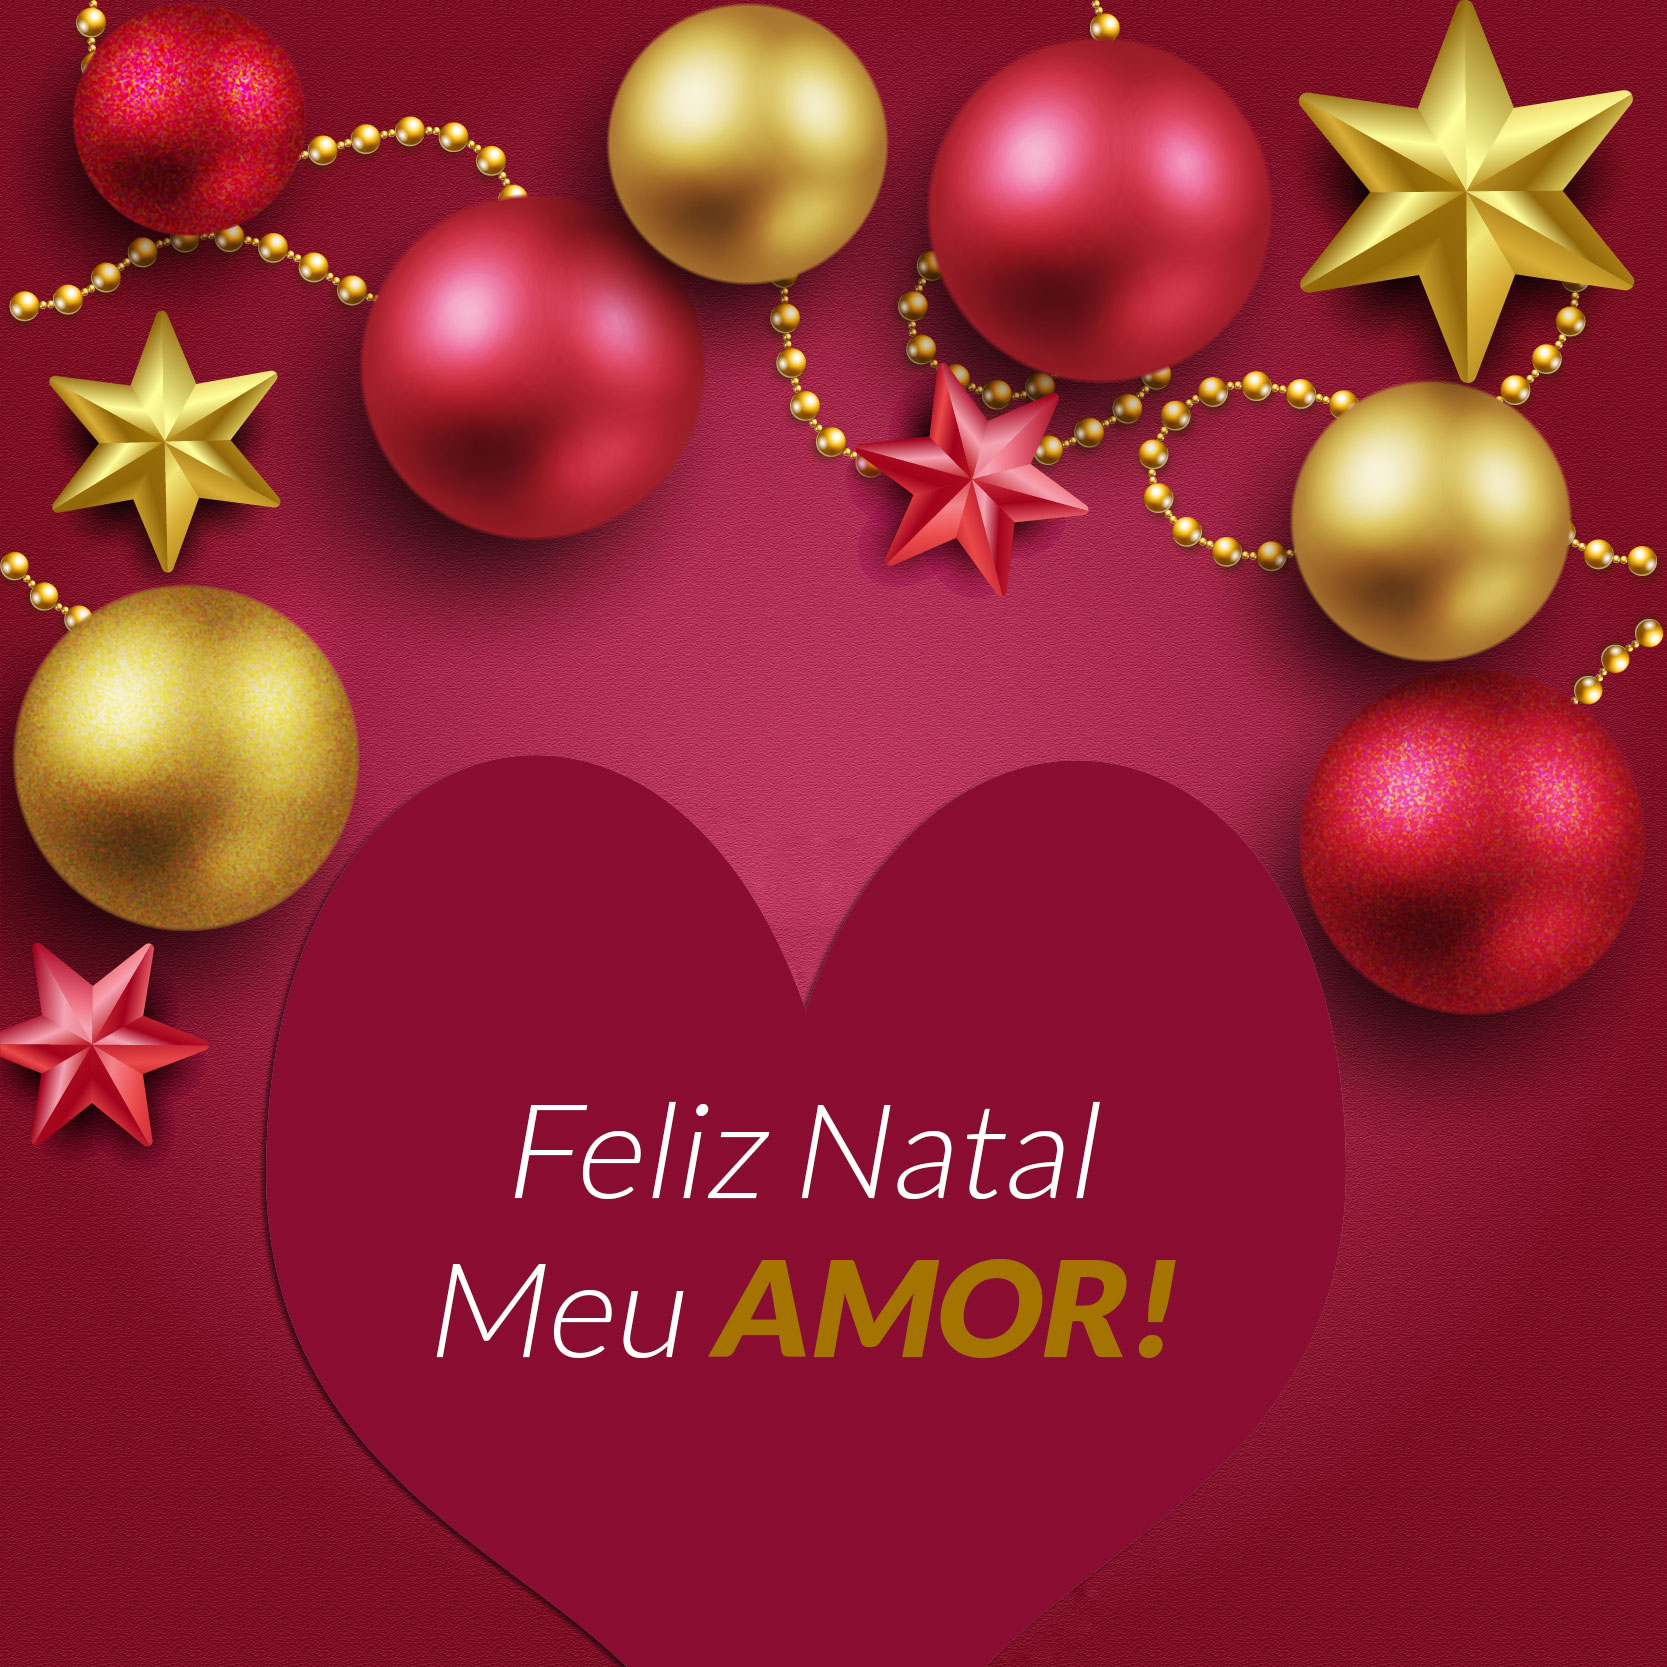 Feliz Natal Meu Amor!